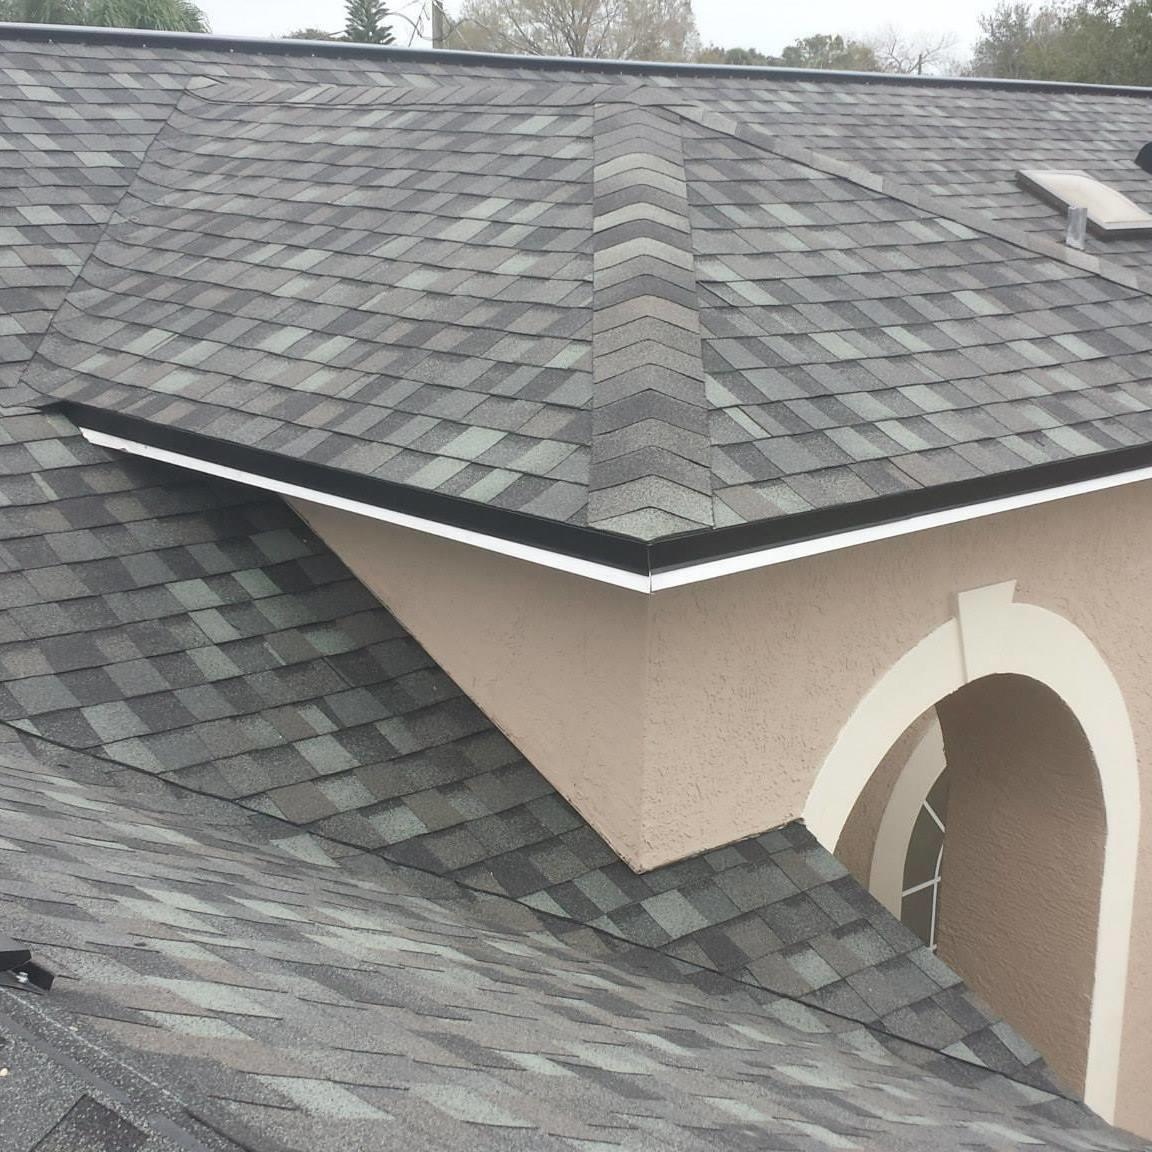 Roofing Repairs Merritt Island Fl